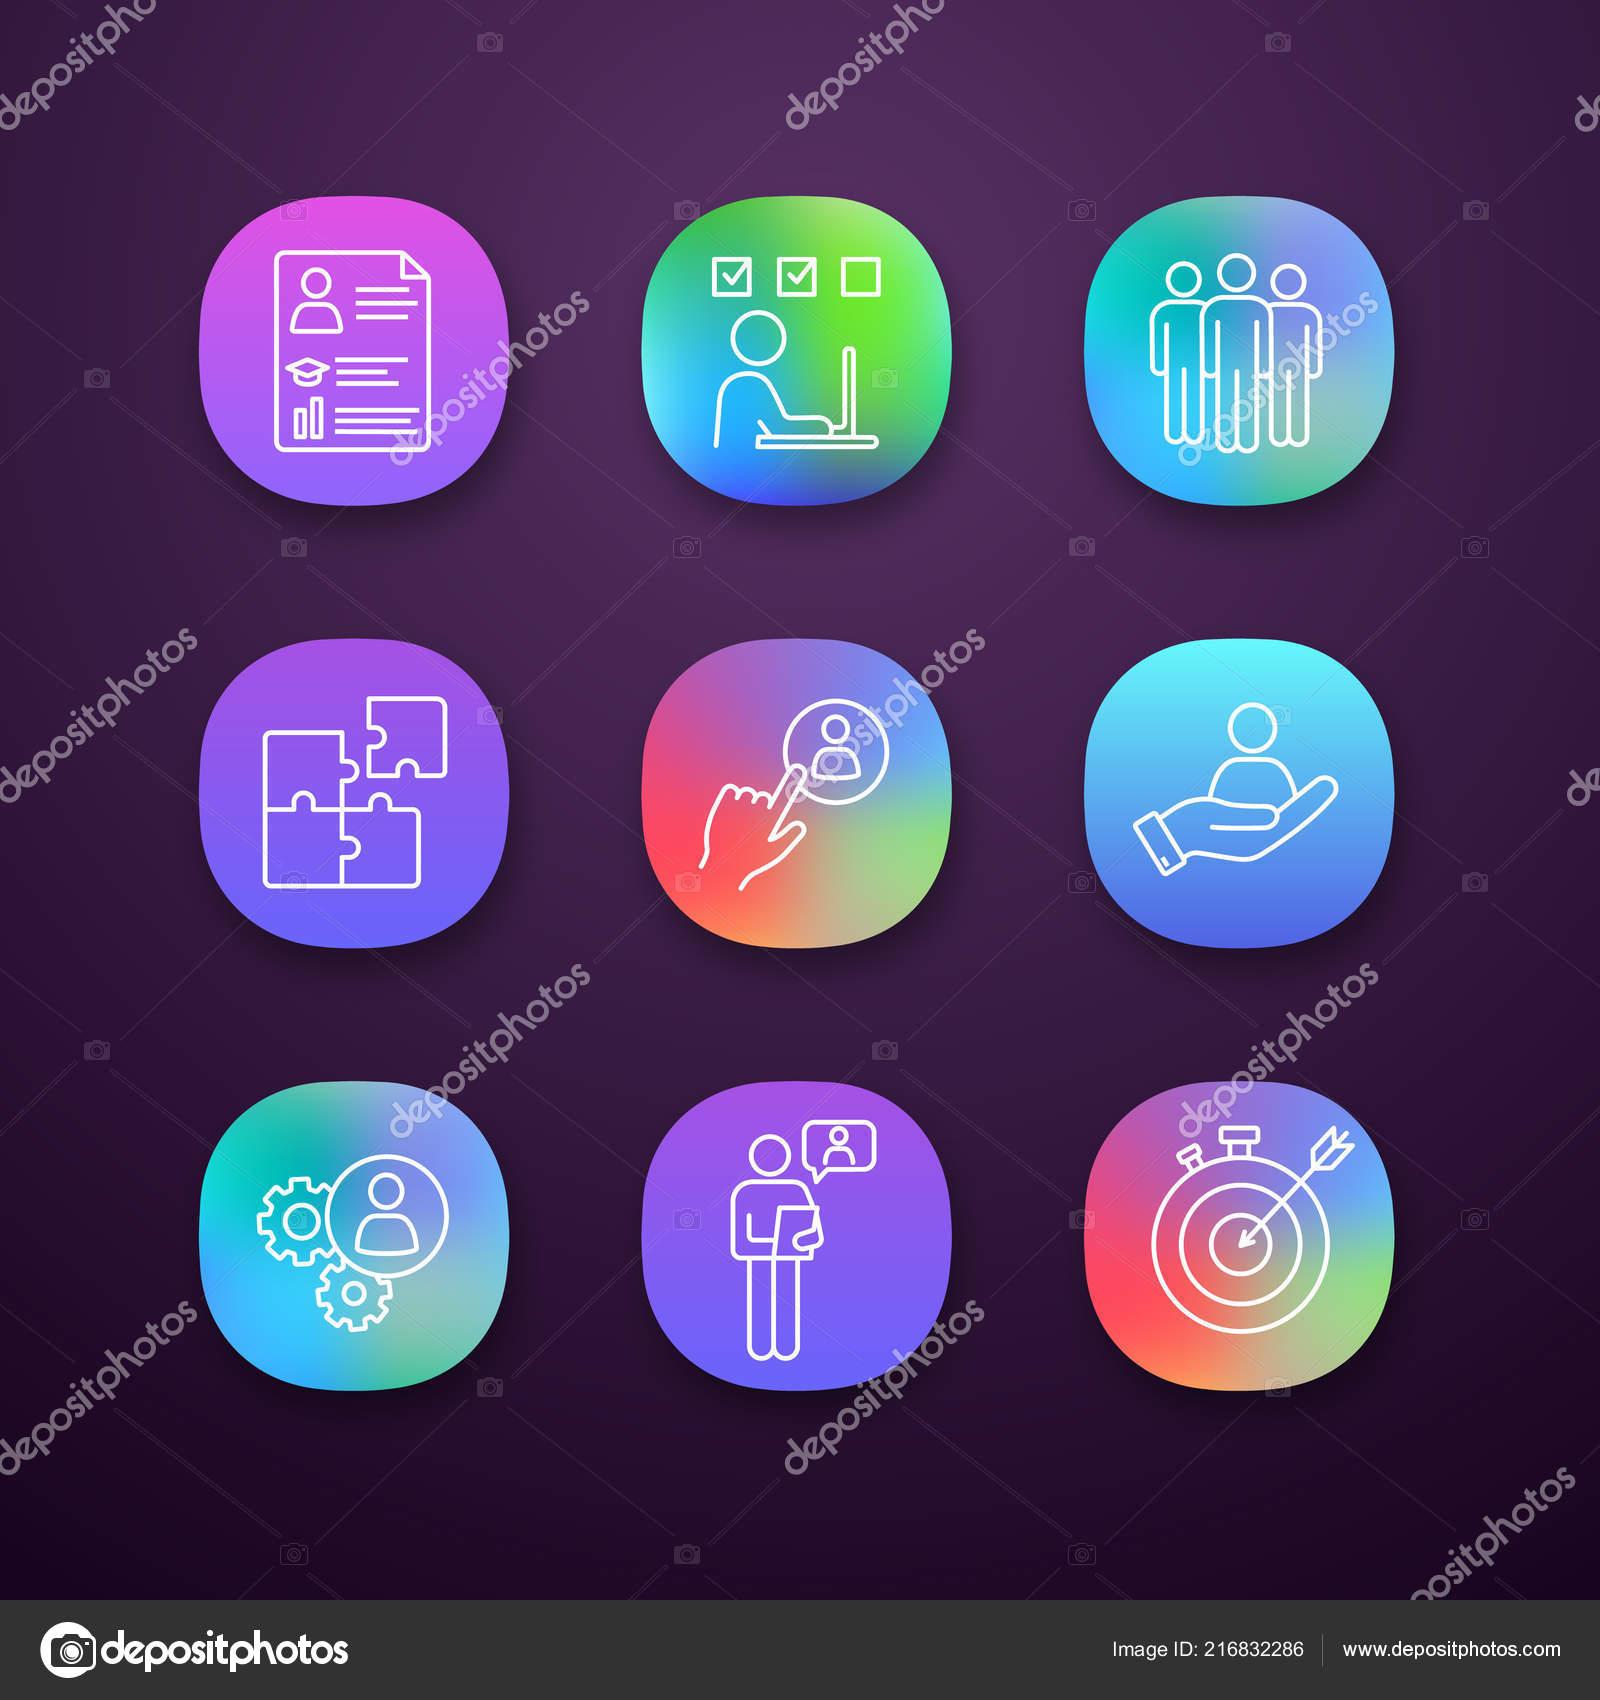 önéletrajz ikonok Üzleti Menedzsment App Ikonok Beállítása Önéletrajz Feladat  önéletrajz ikonok